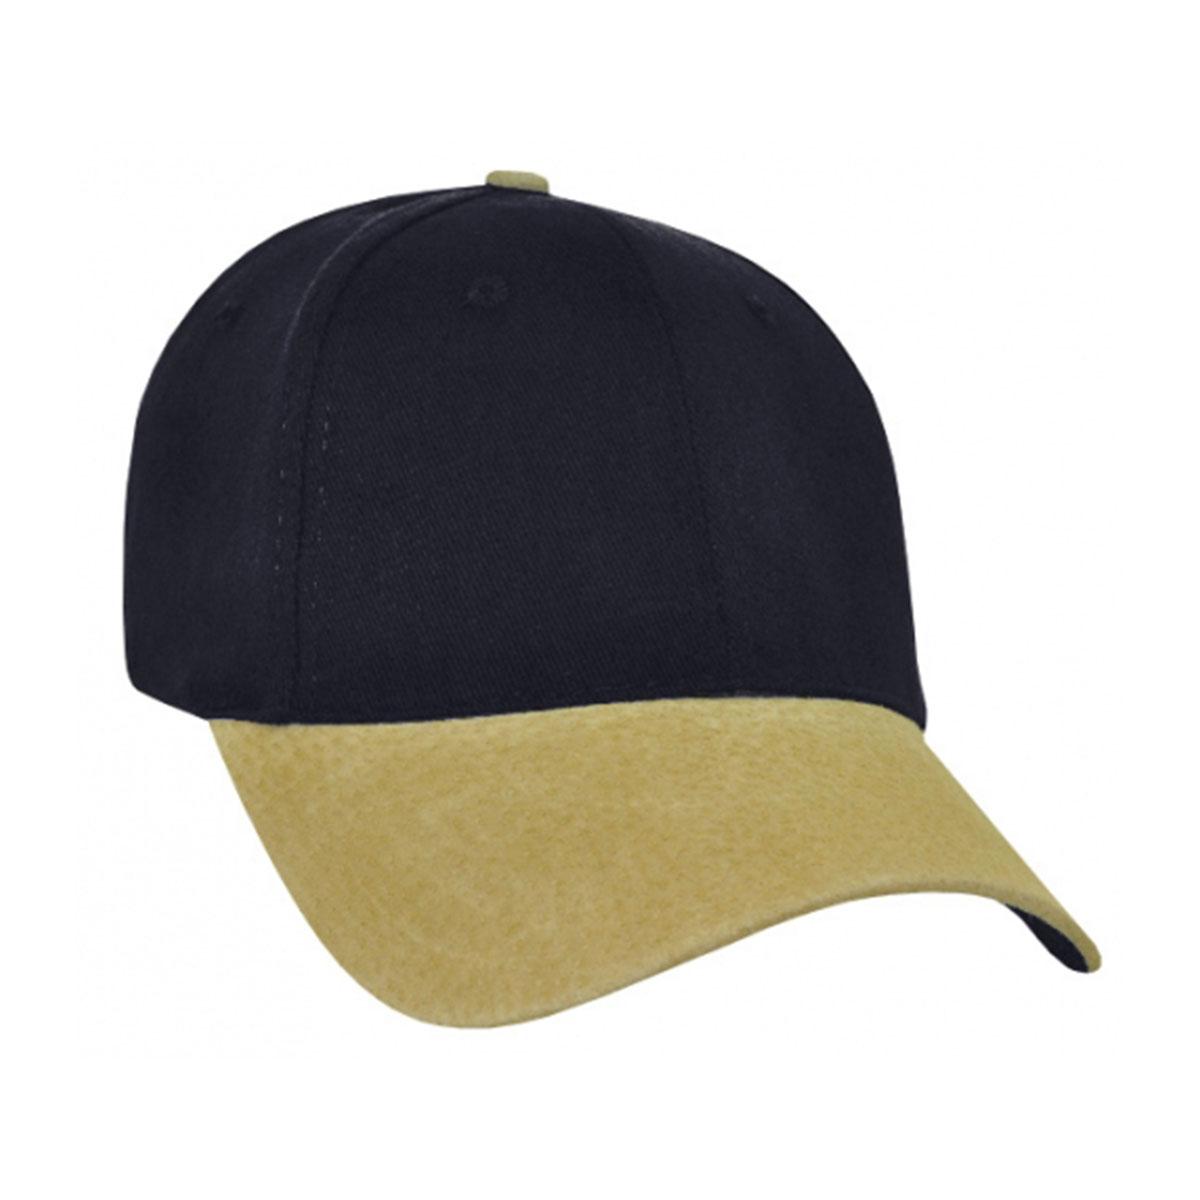 Heavy Brushed Cotton Suede Peak Cap-Navy / Tan